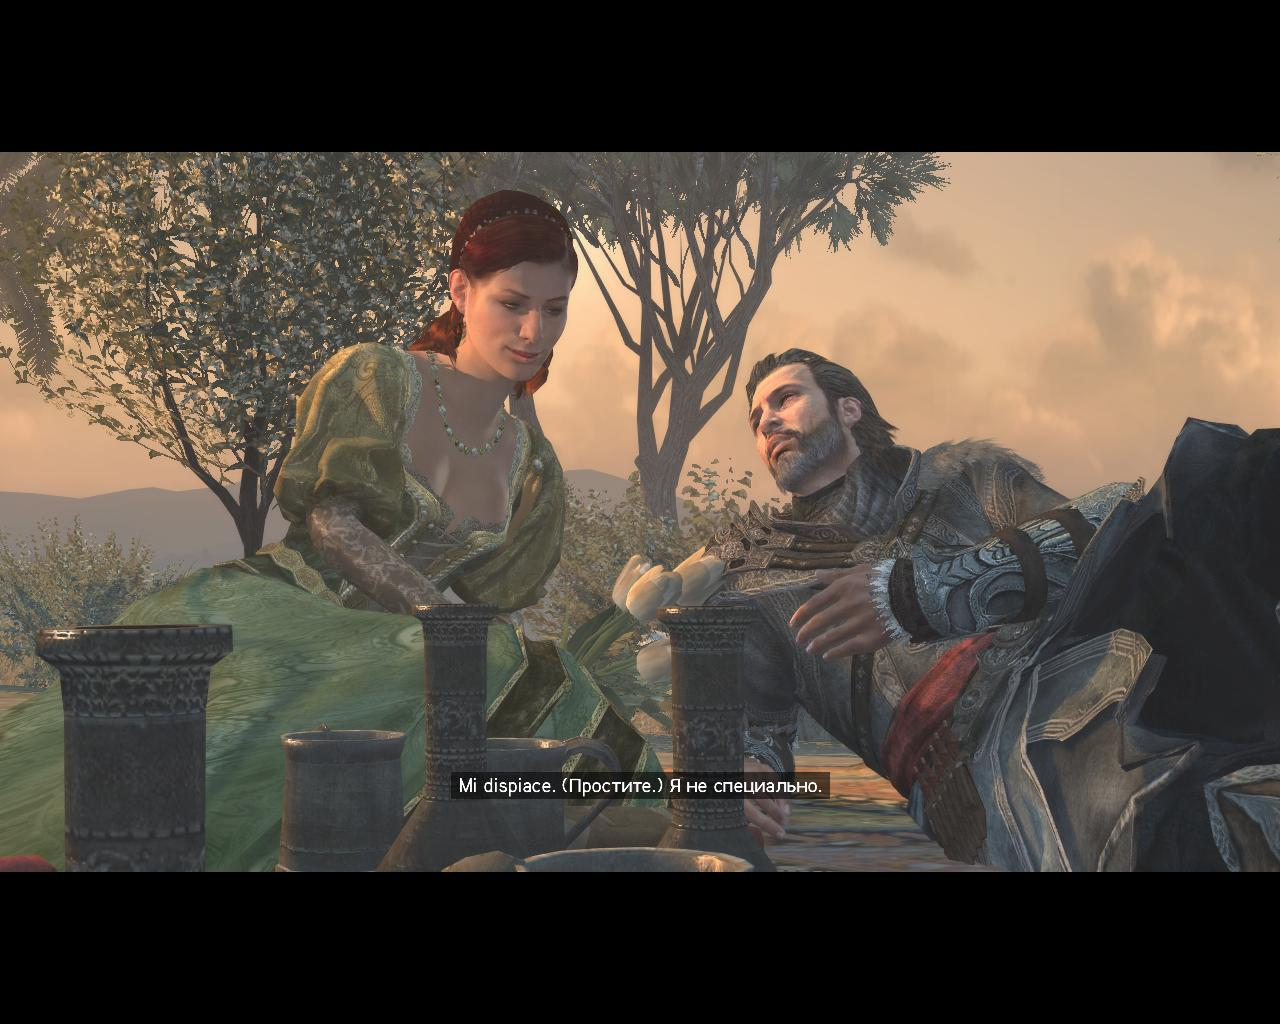 ACRSP 2011-11-25 01-04-34-28.jpg - Assassin's Creed: Revelations